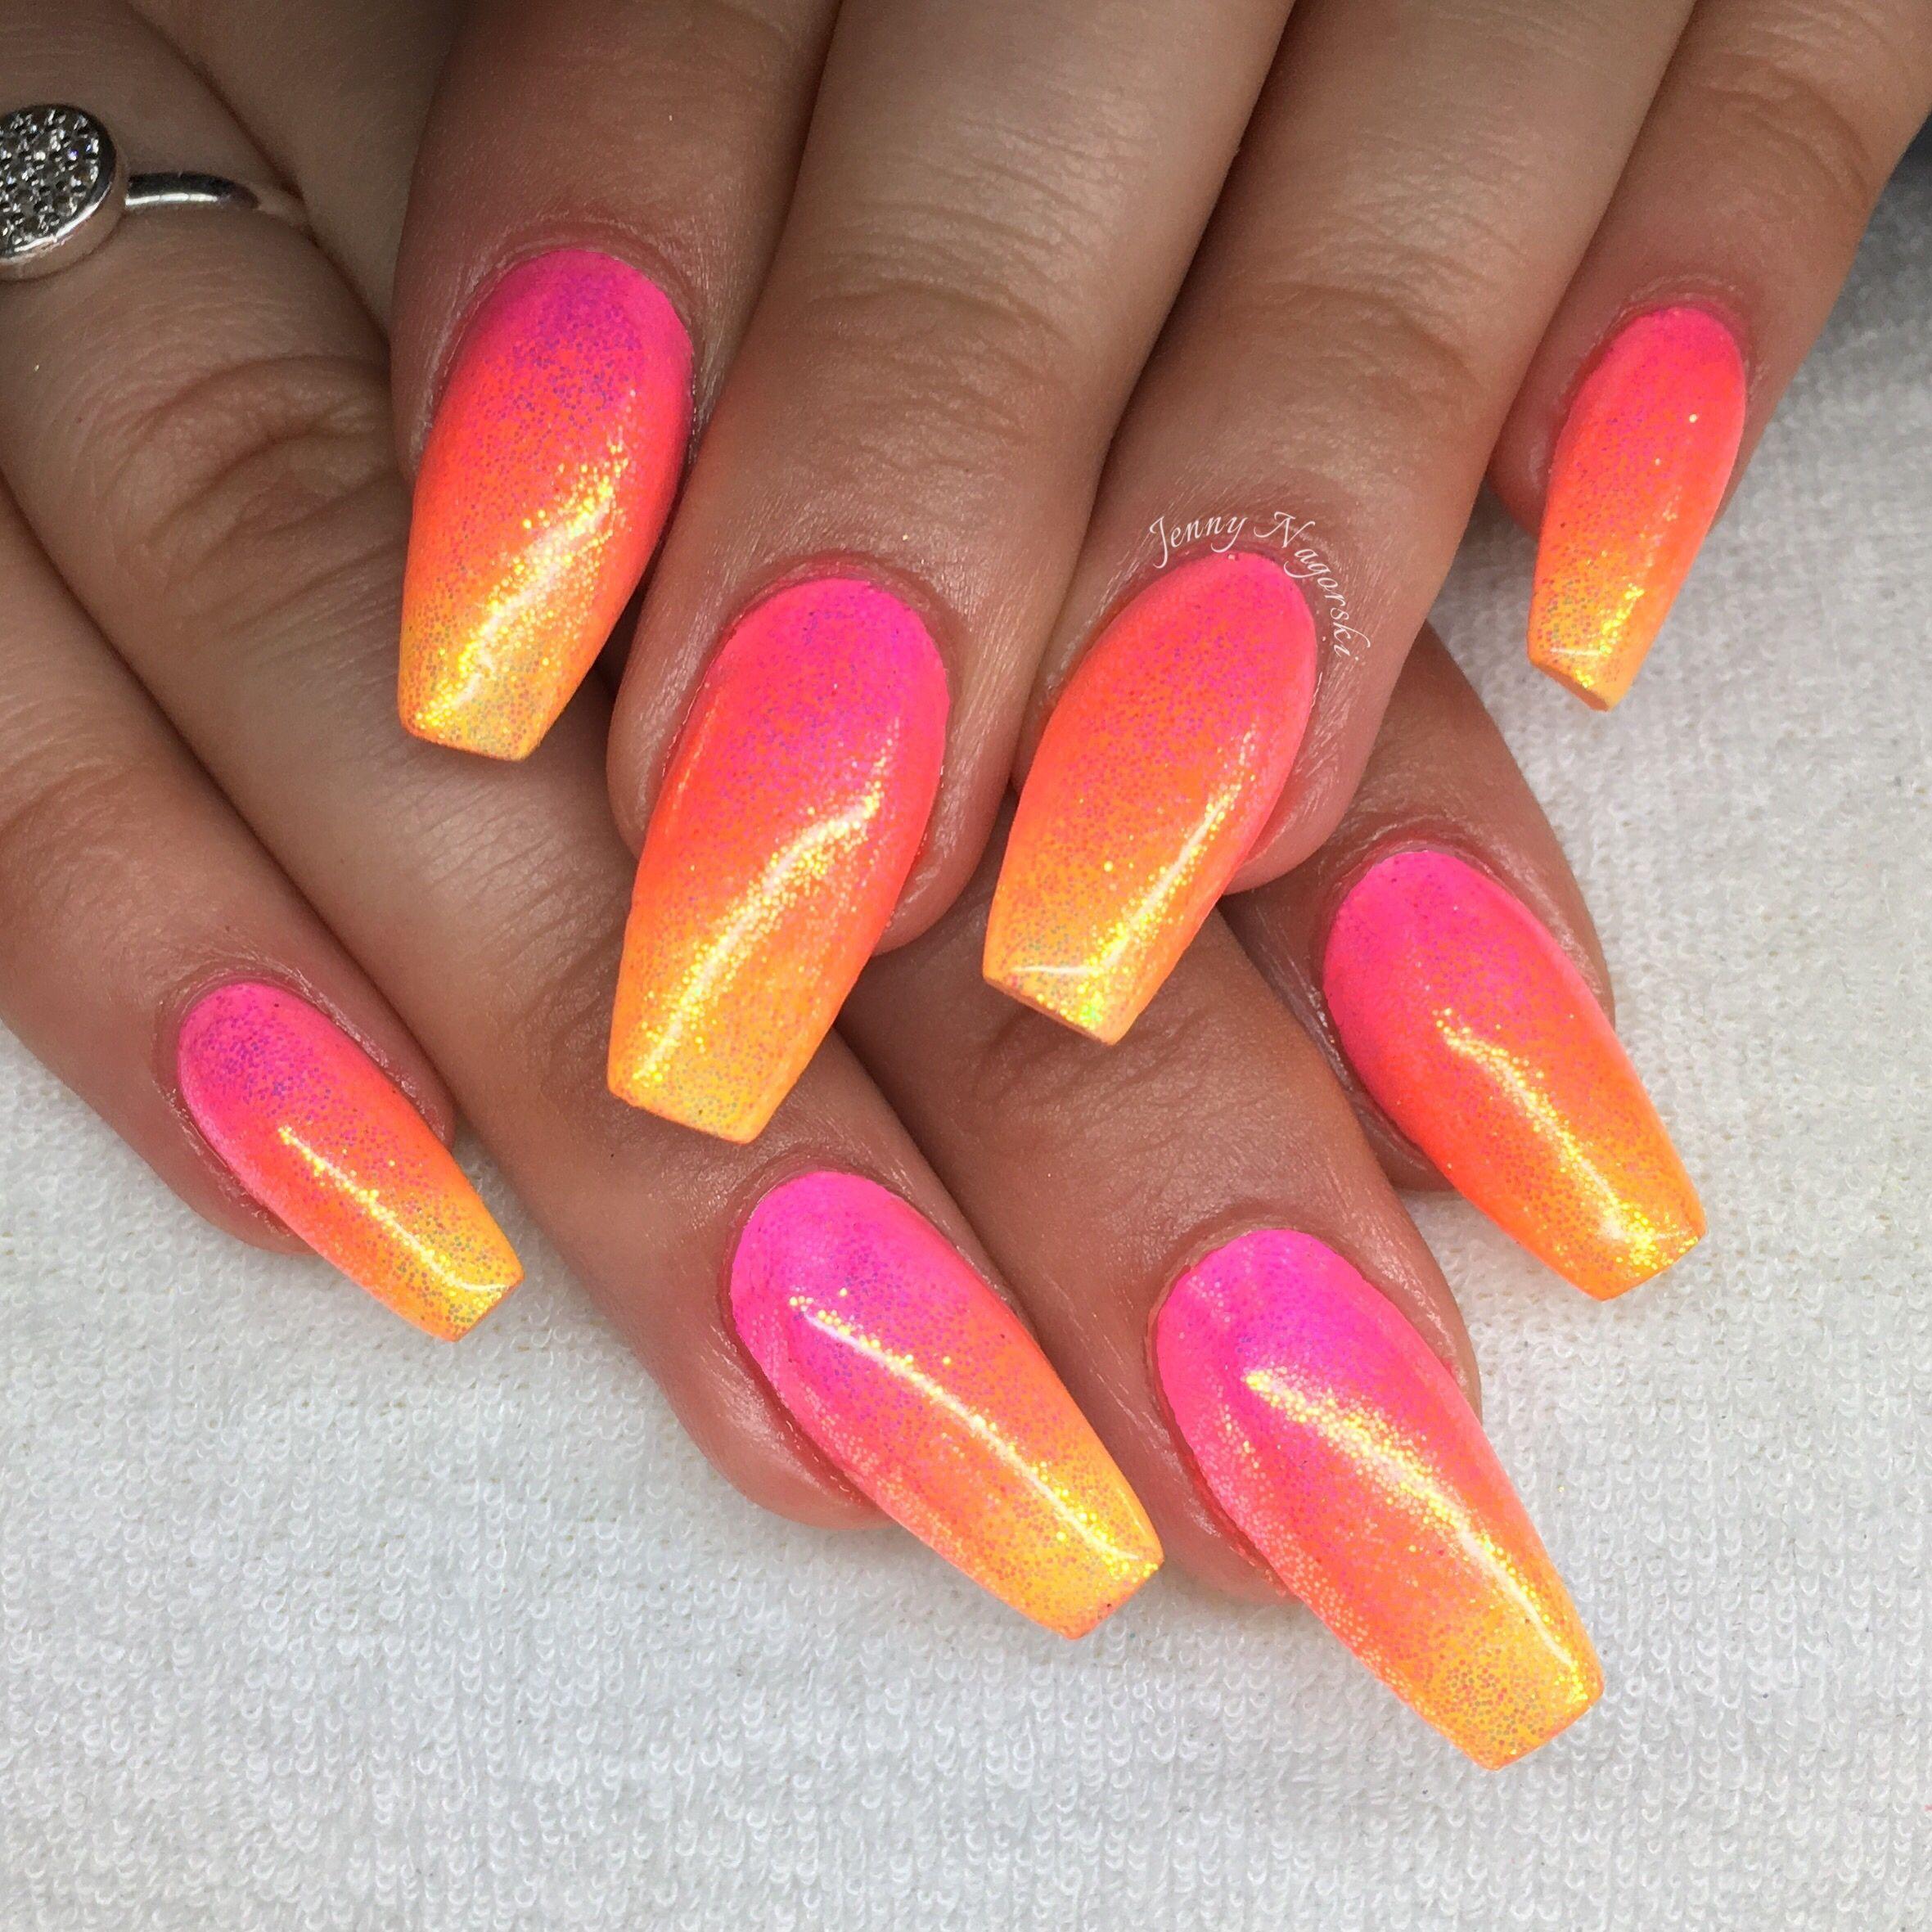 Sunset nails Sunset nails, Nail designs bling, Festival